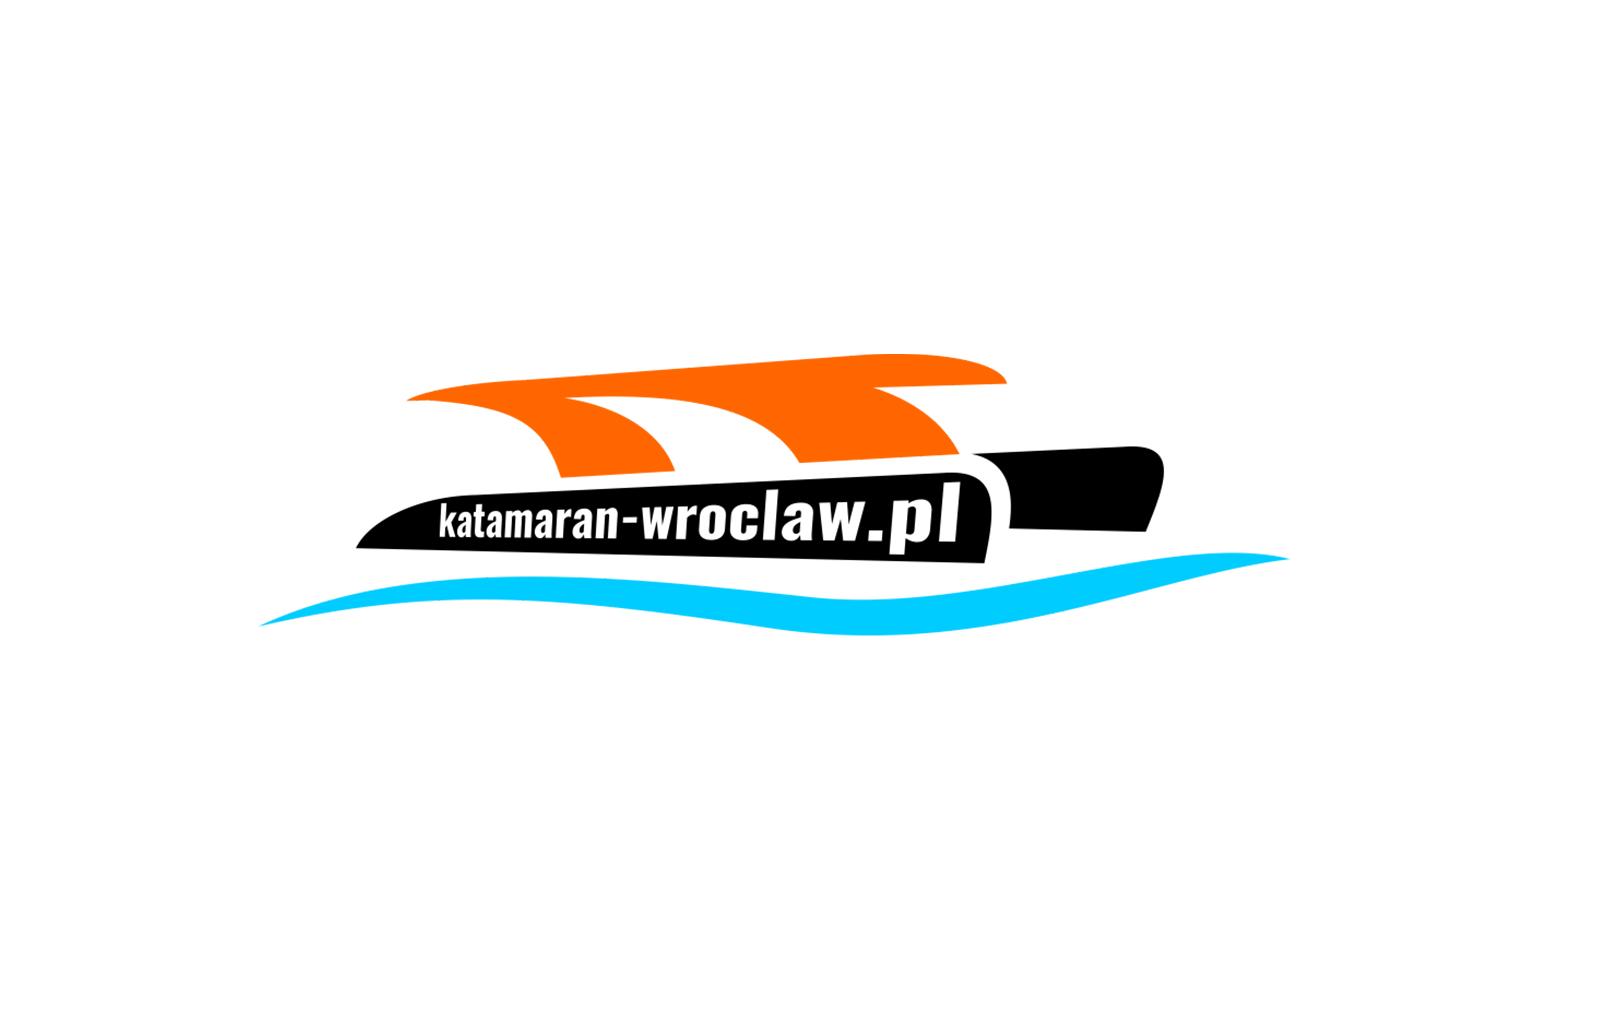 katamaran-wroclaw